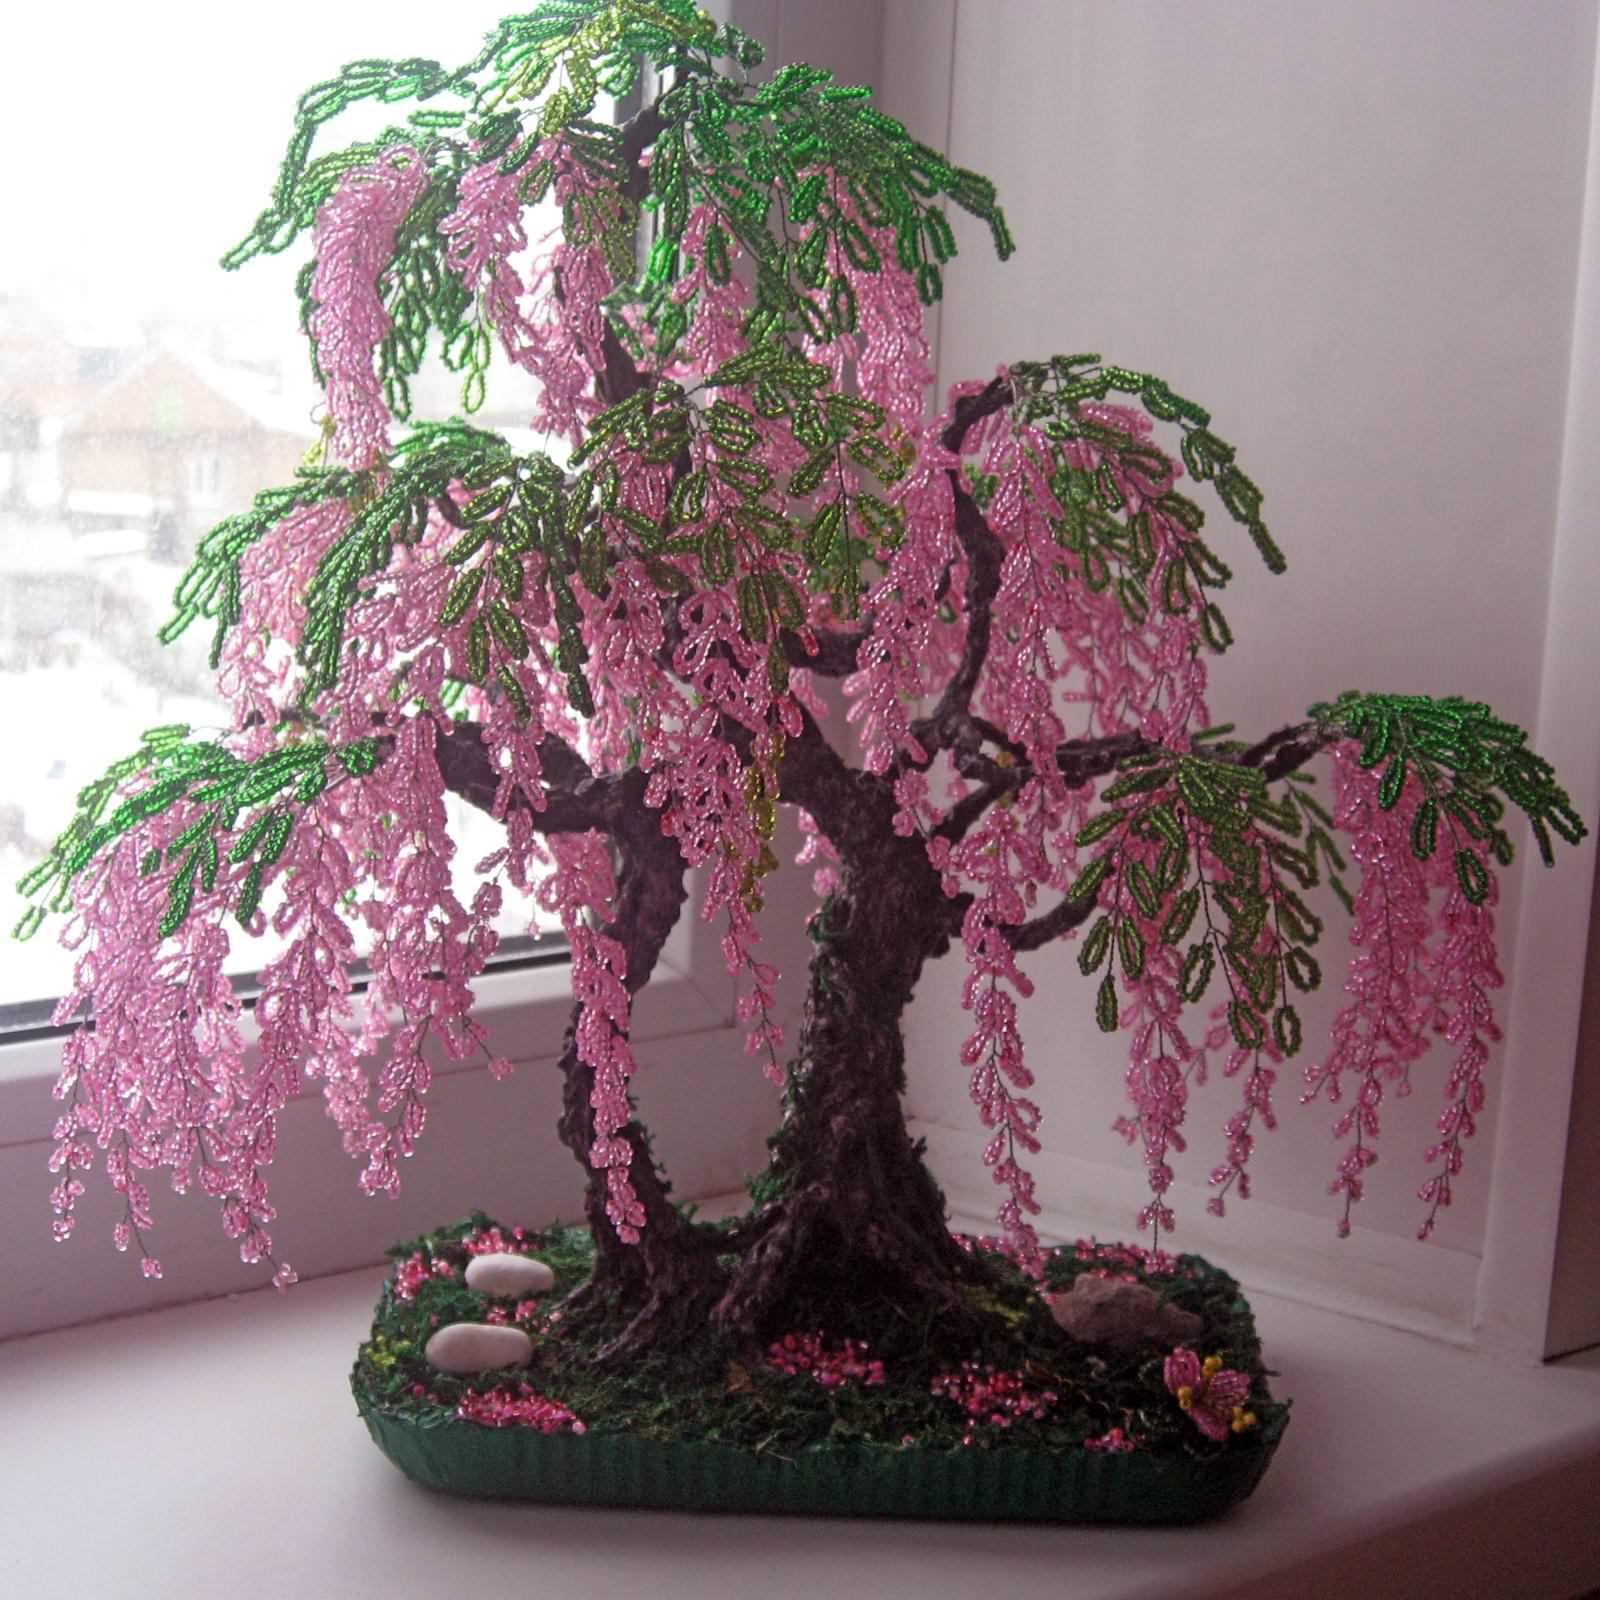 Дерево своими руками из бисера фото